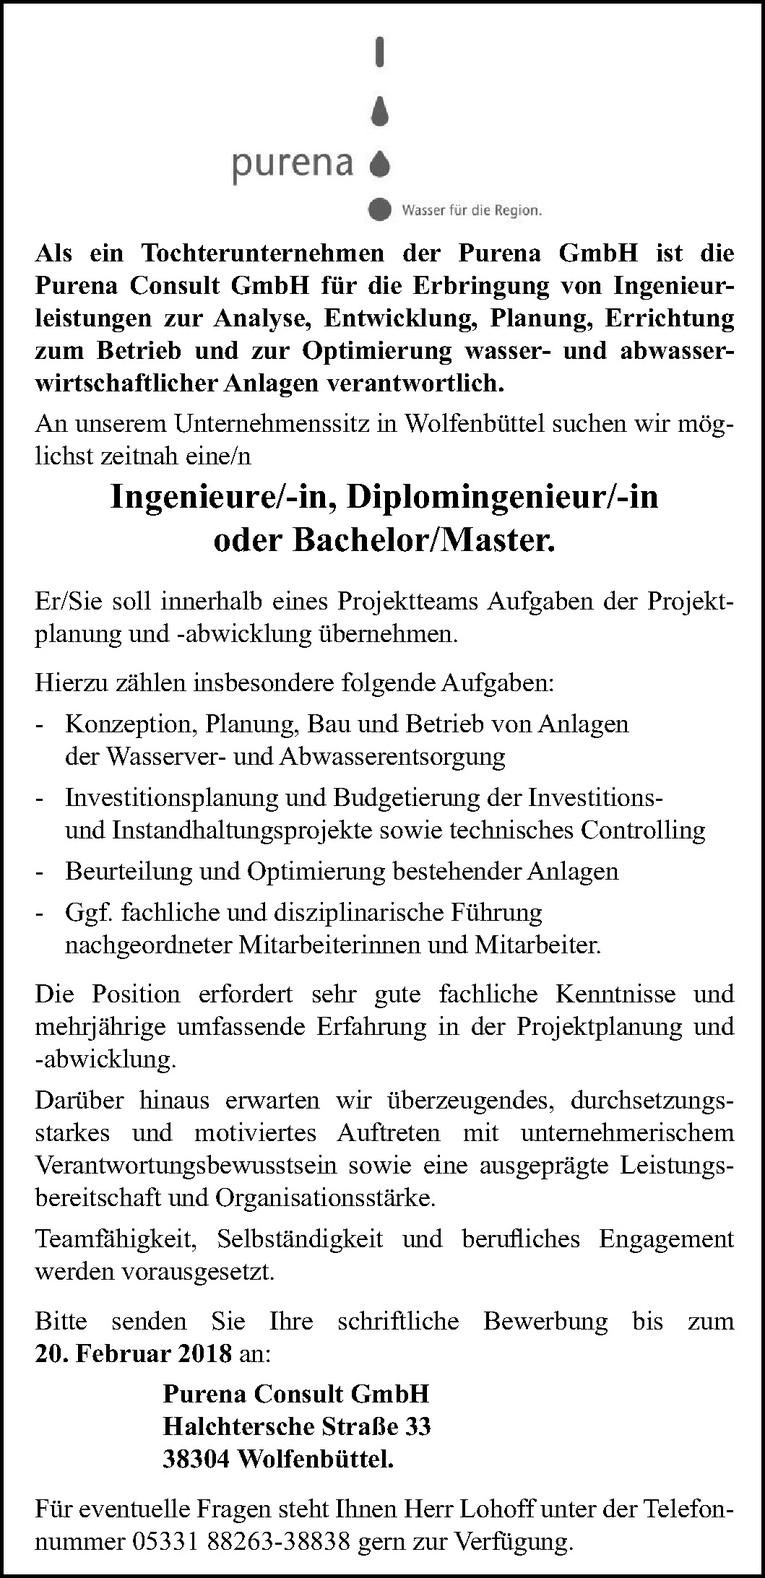 Ingenieure / Diplomingenieur / Bachelor / Master